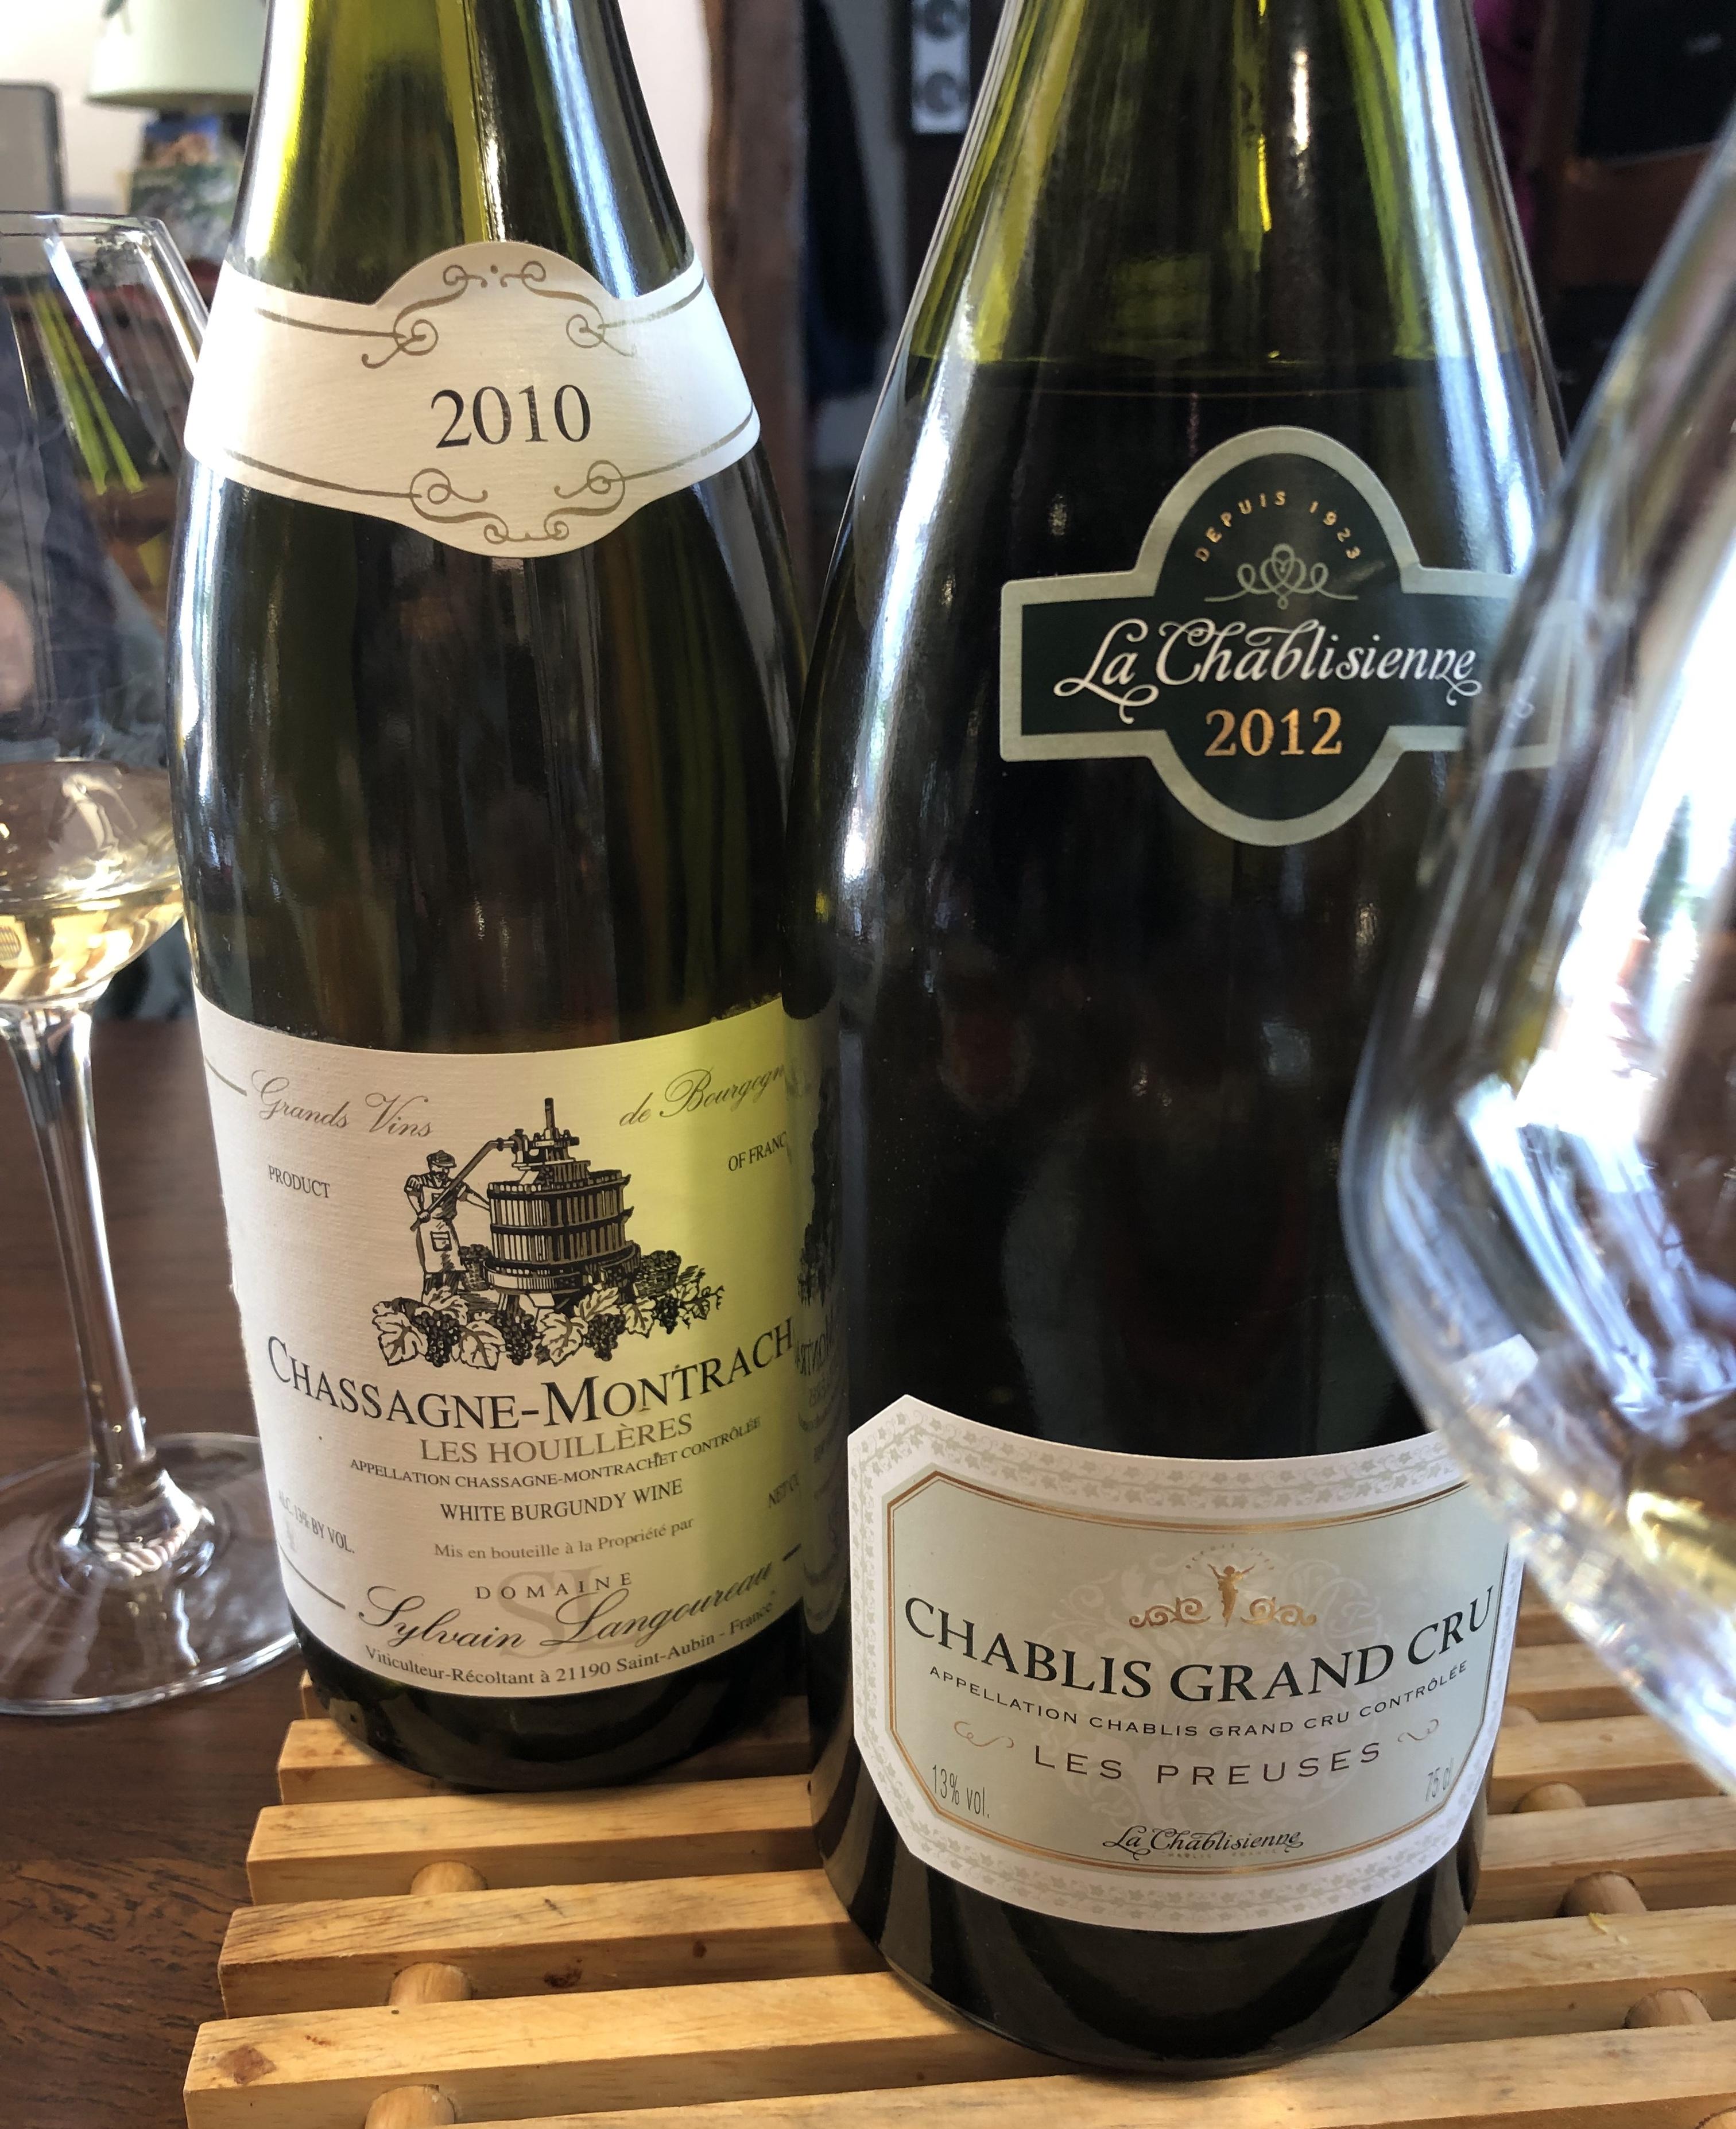 Chablis Grand Cru Chassagne-Montrachet Bourgogne